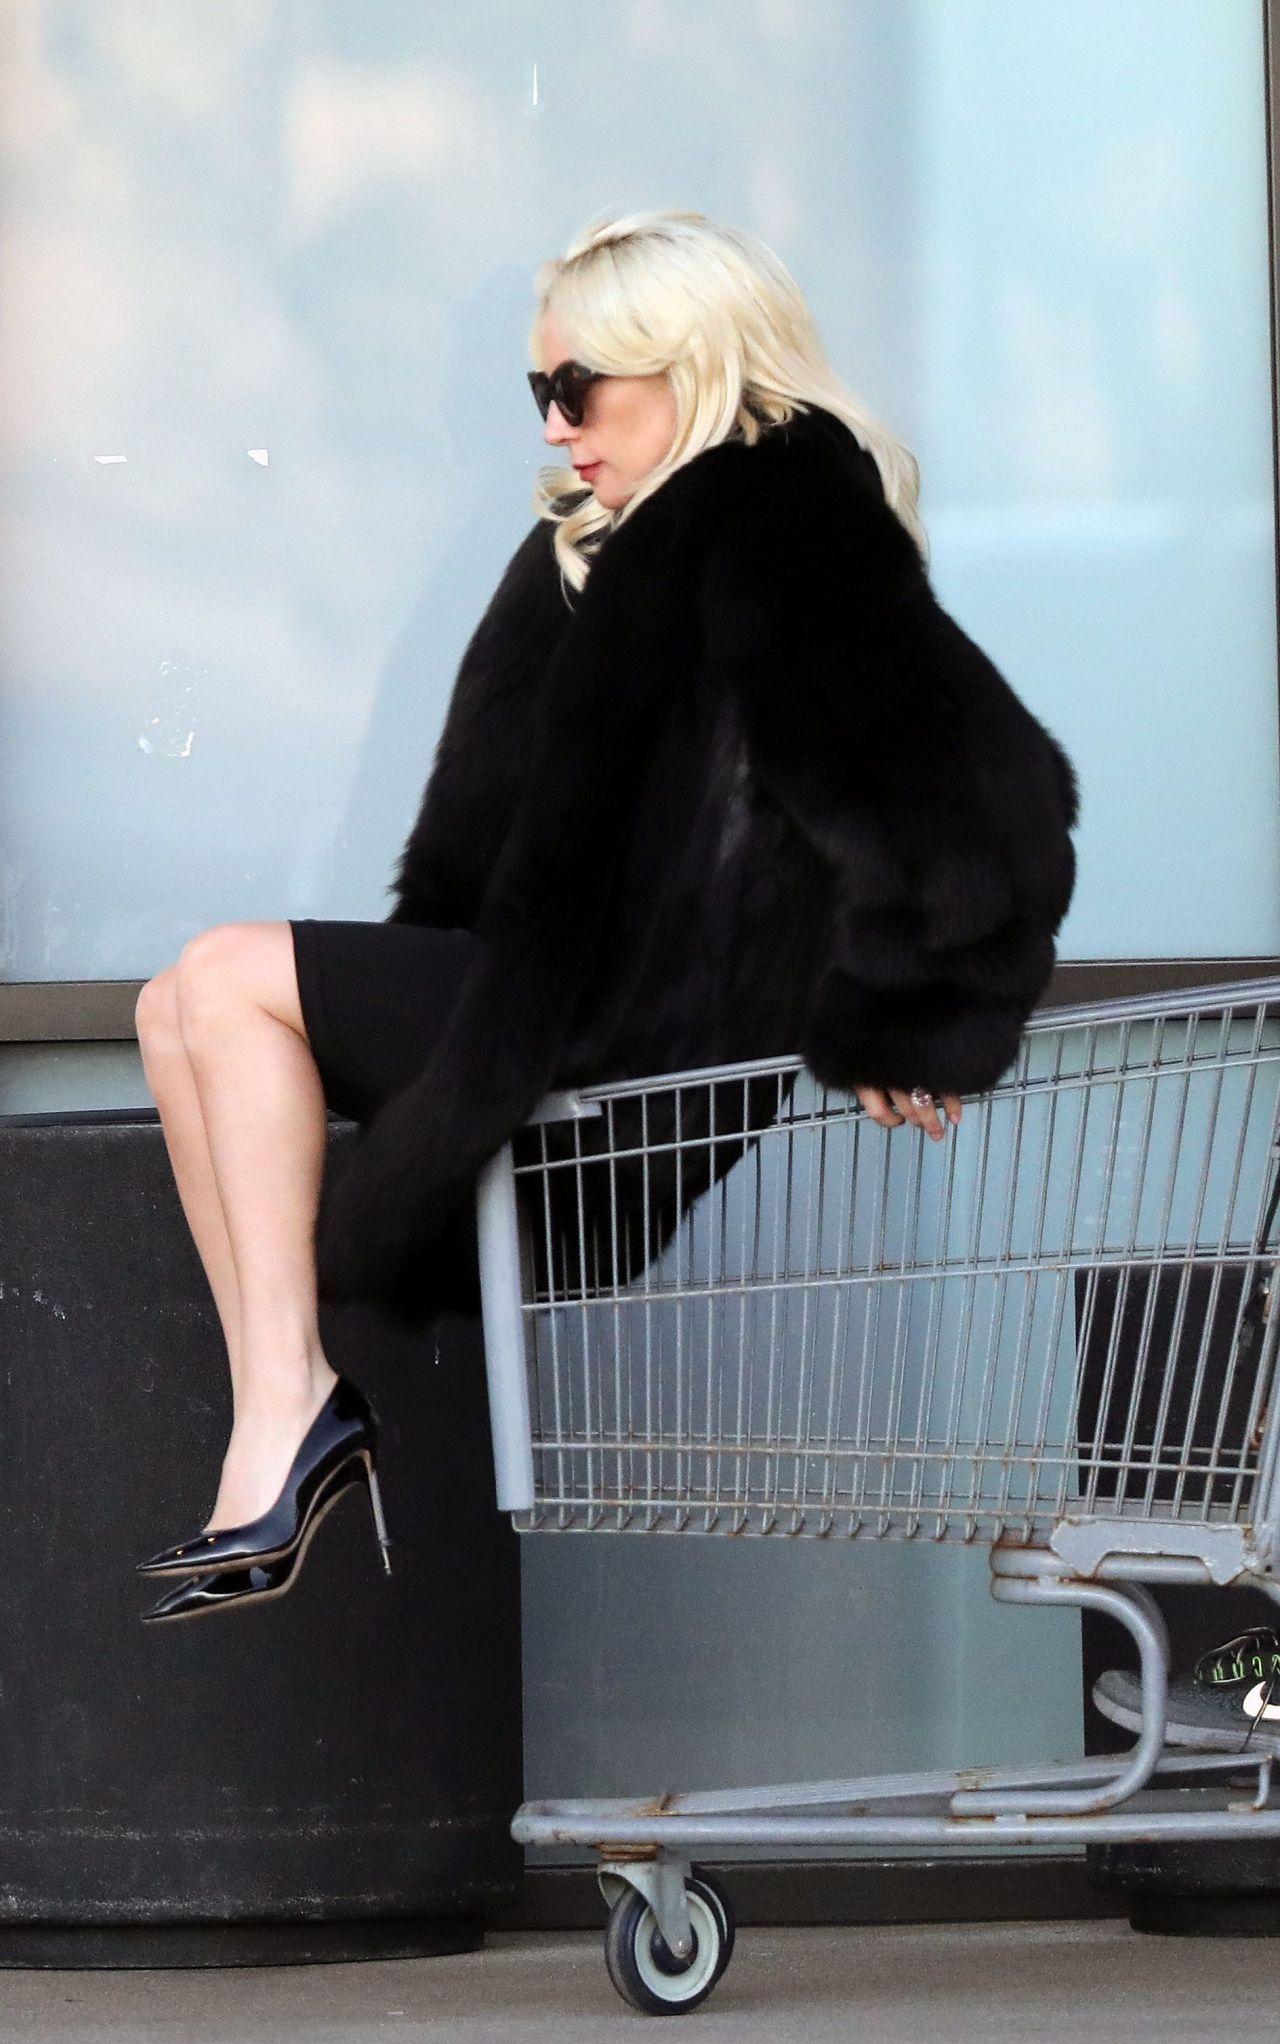 Lady Gaga Ladygaga Shopping Cart Ride In Malibu 21122017 Http